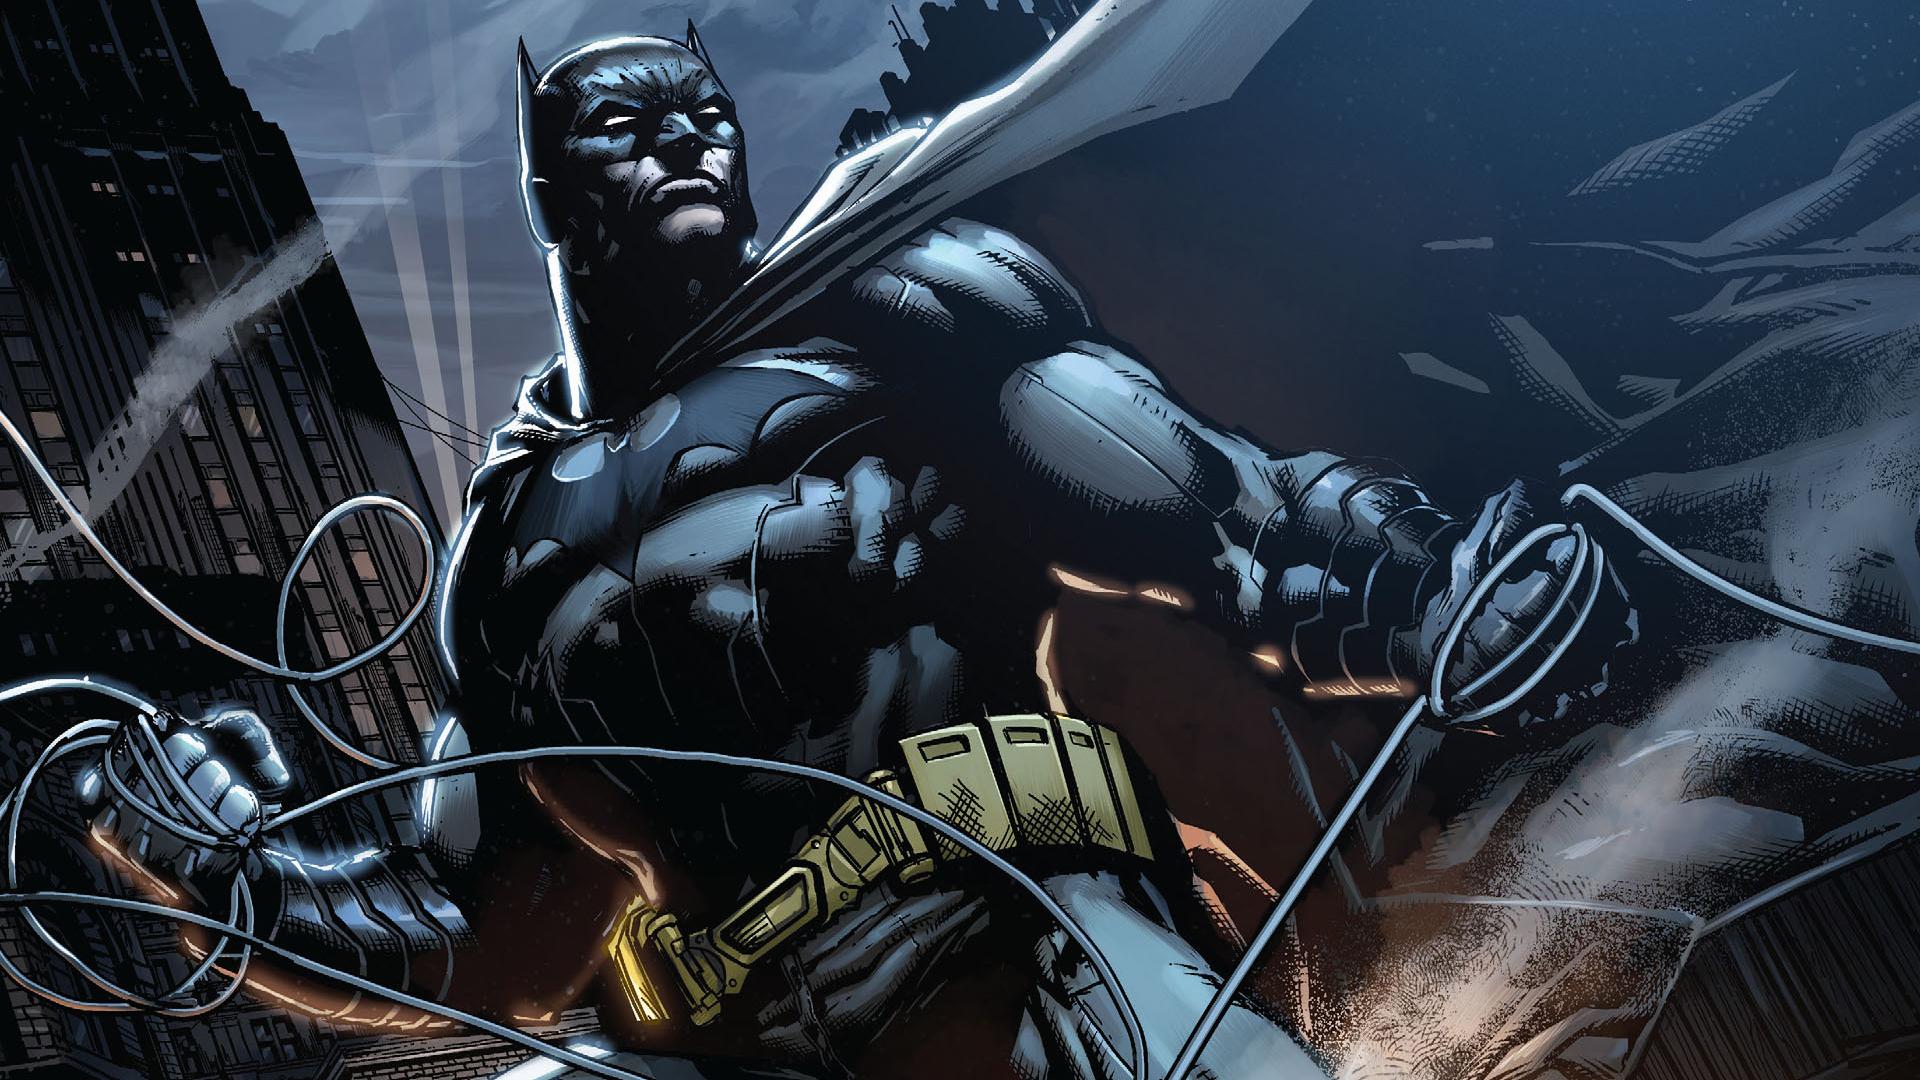 batman full hd wallpaper and background image | 1920x1080 | id:436532